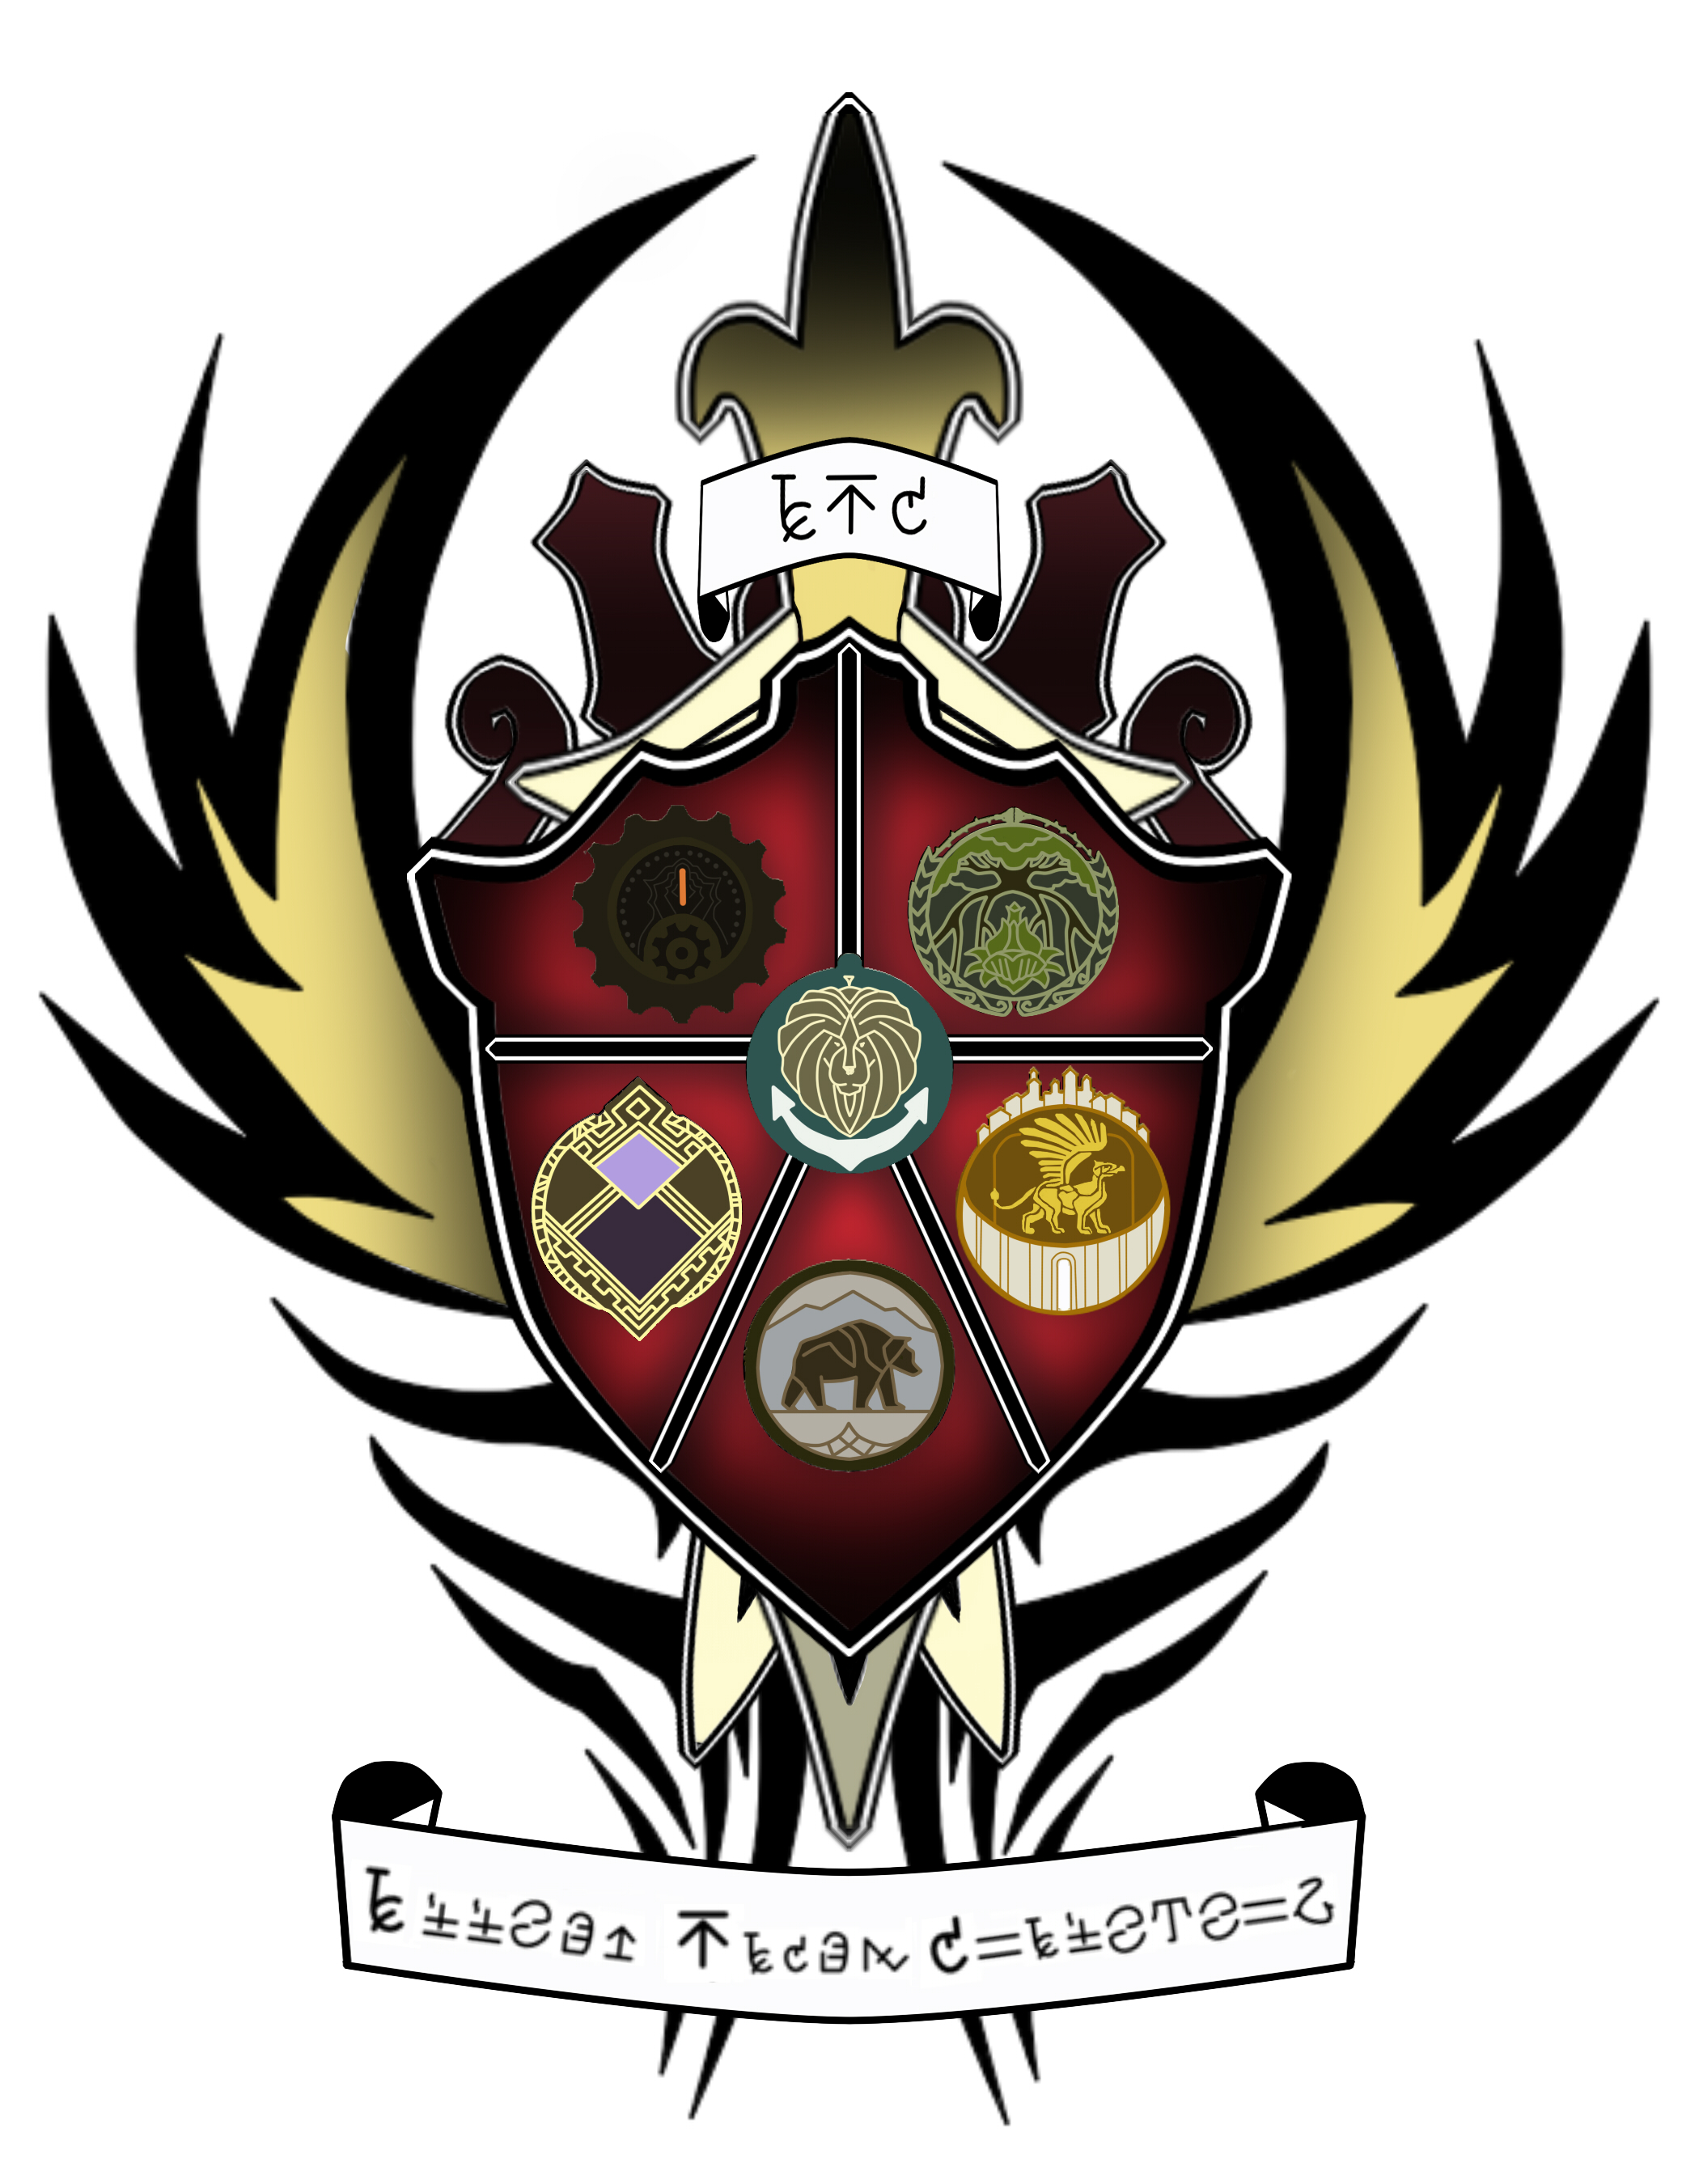 arc guild emblem concept by namgung on deviantart